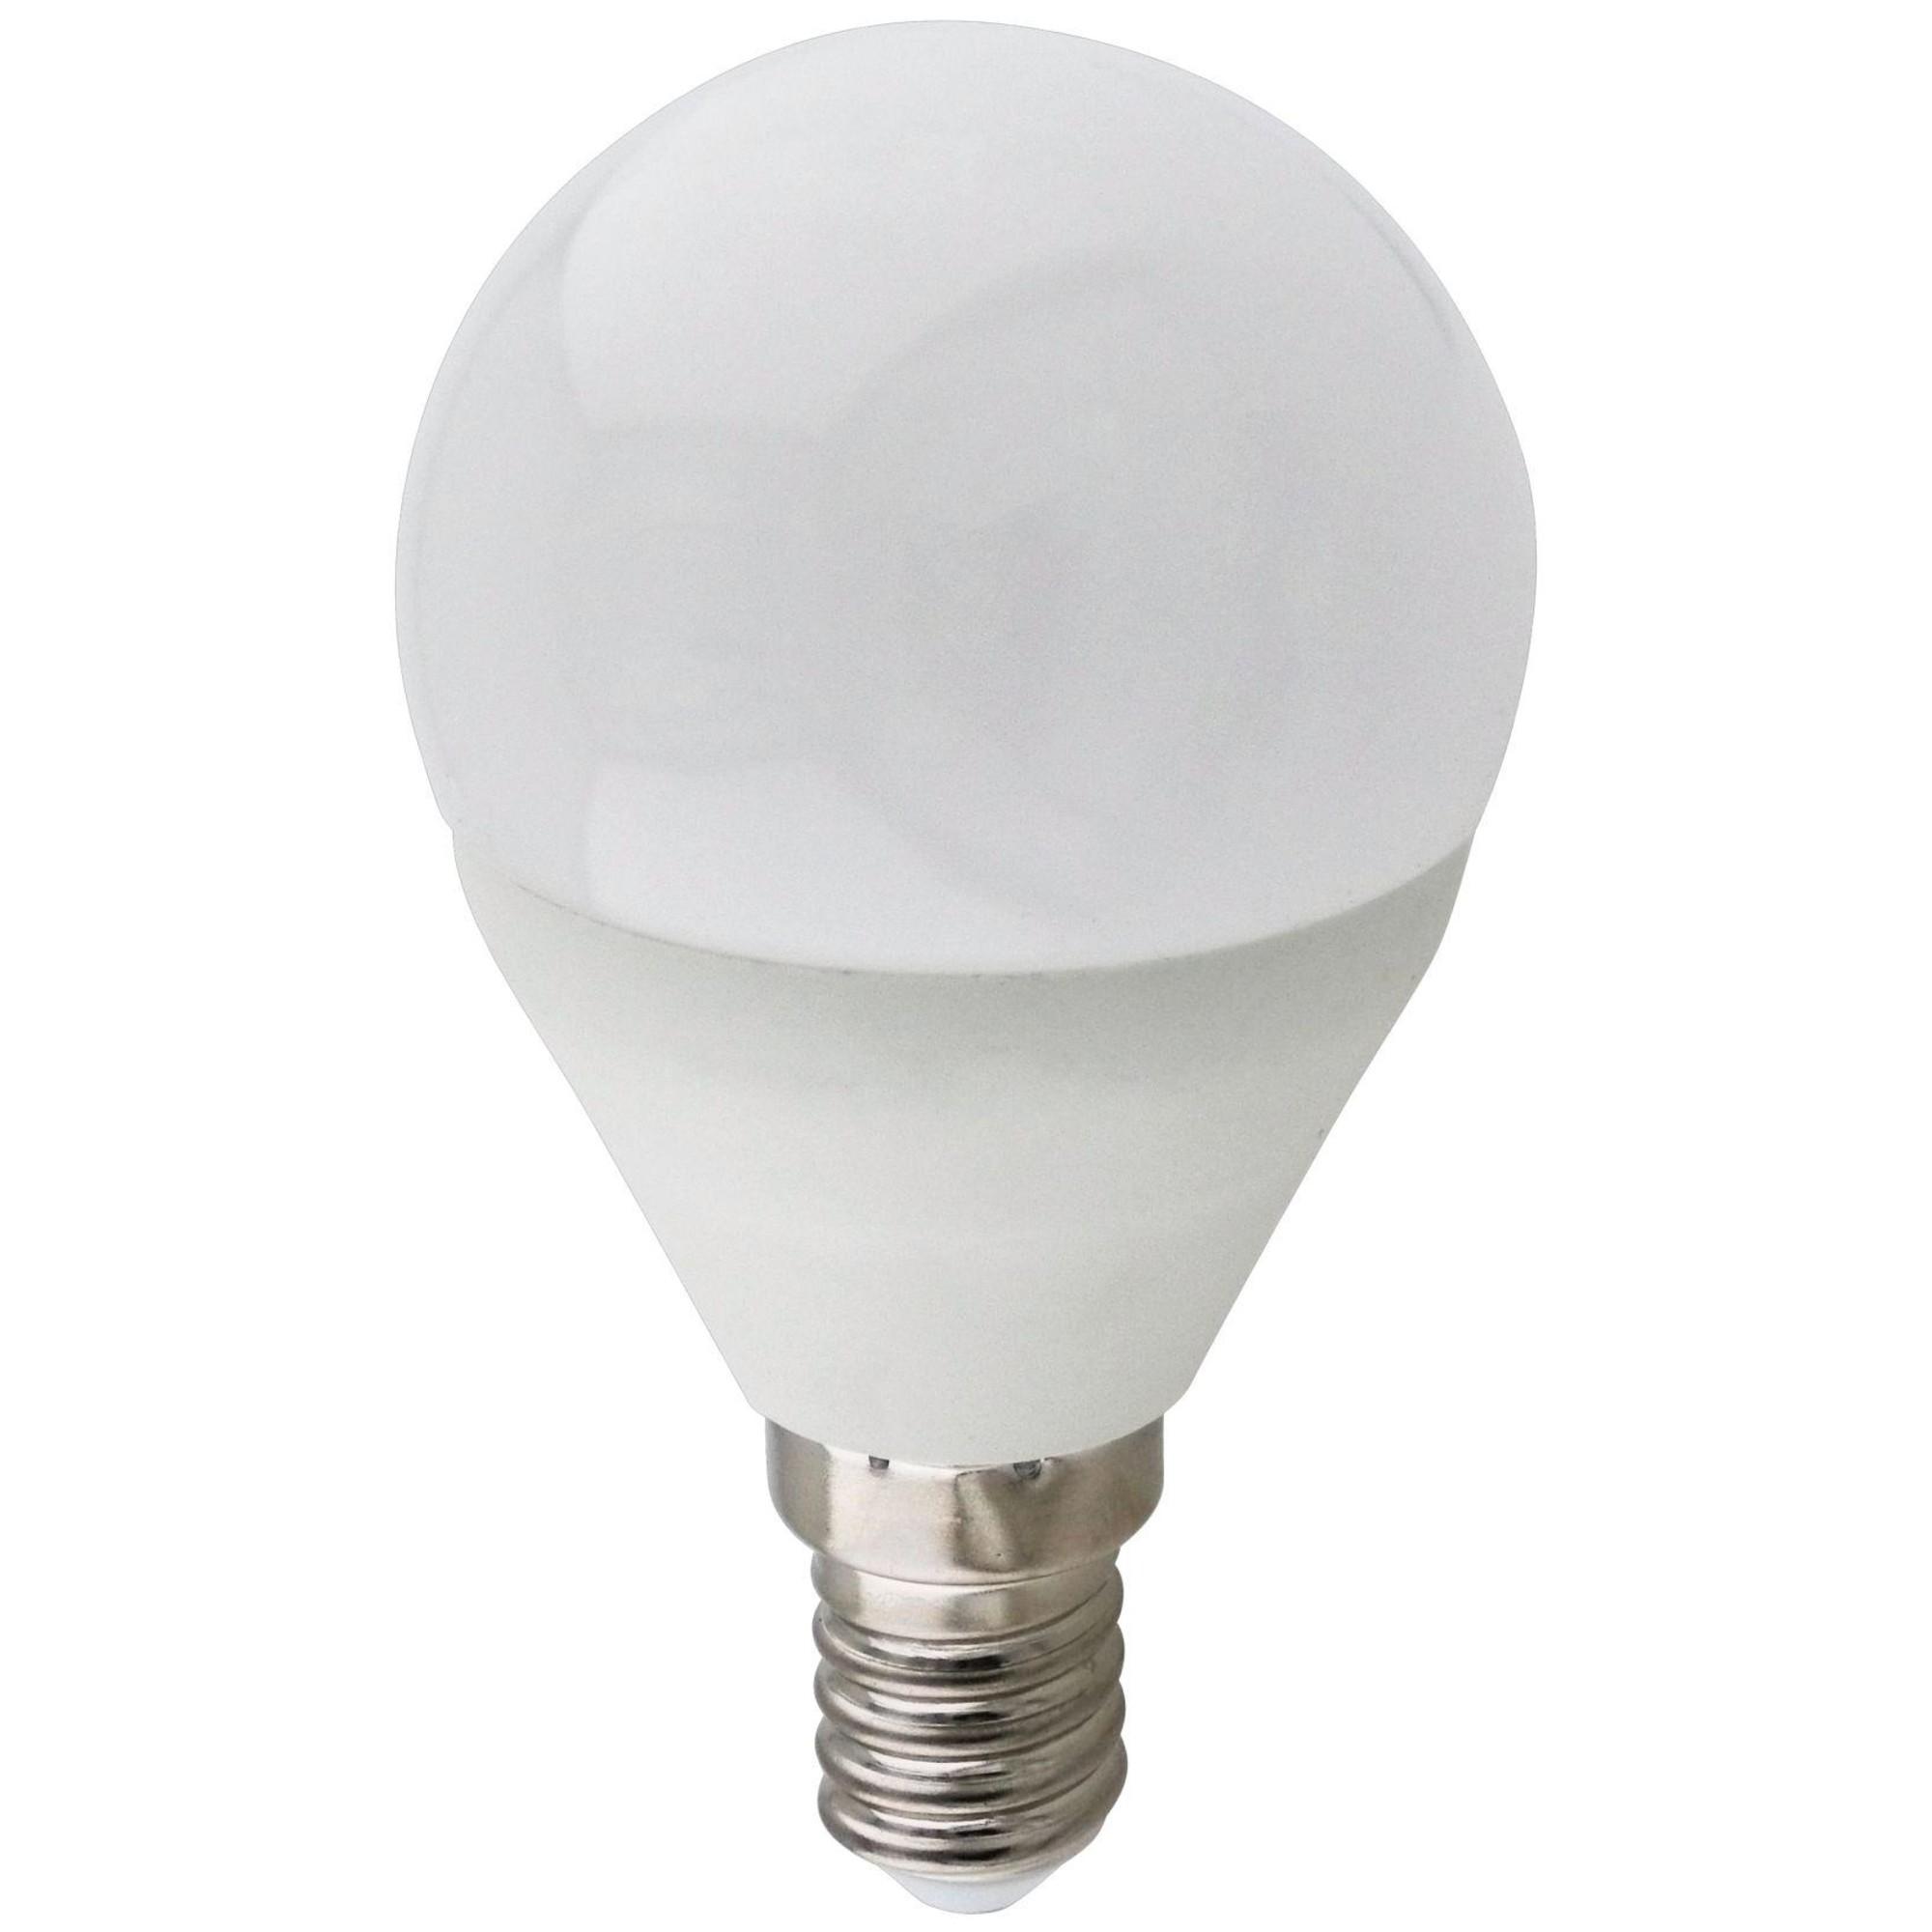 Лампа Ecola Premium светодионая E14 10 Вт шар Лм теплый свет